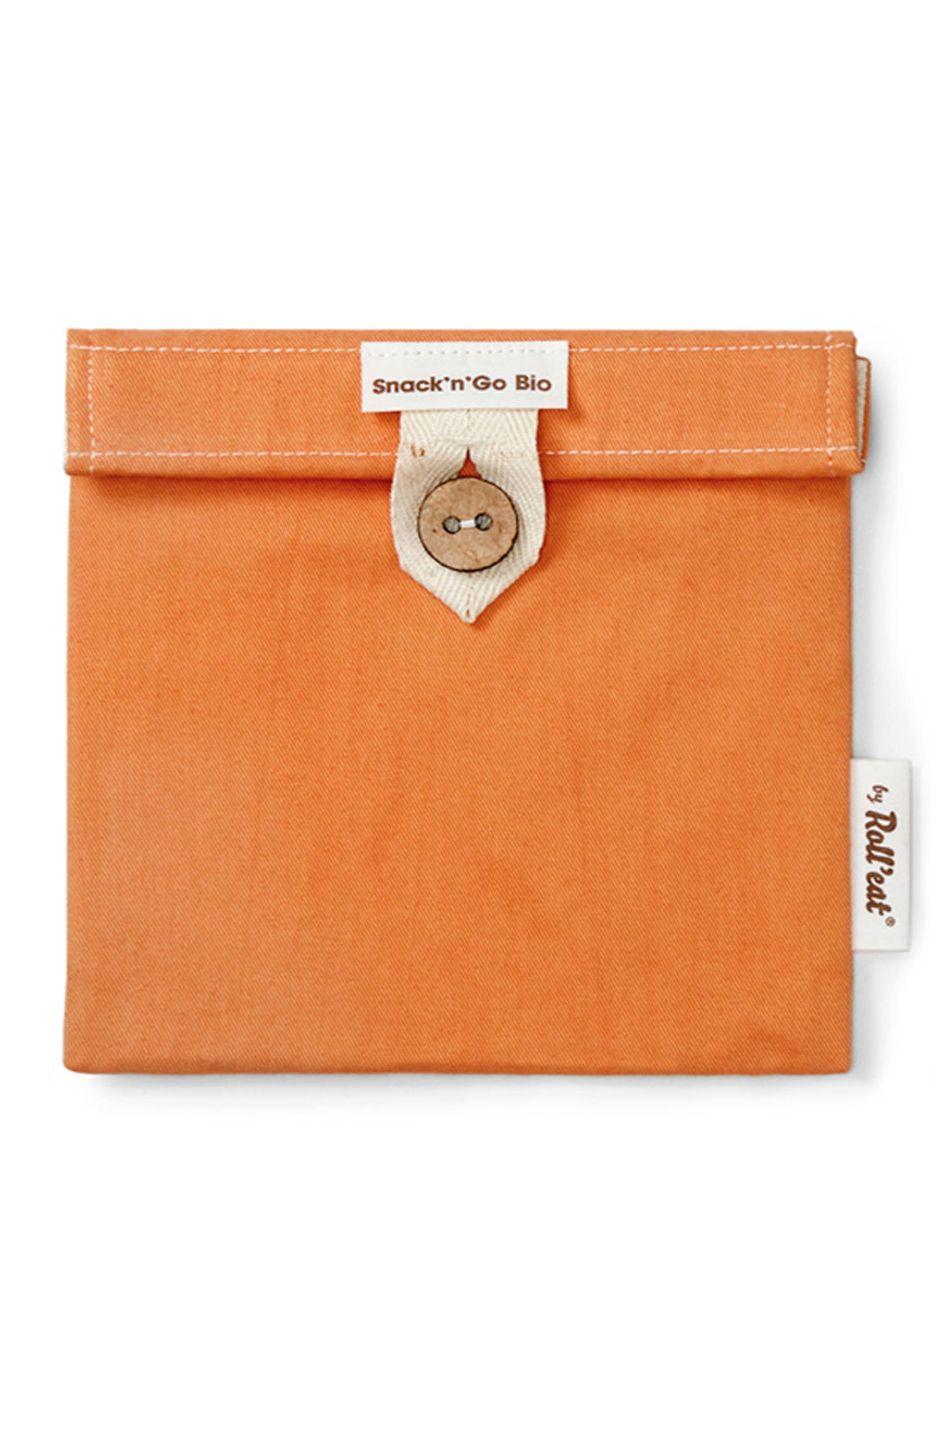 Bolsa Roll'Eat SNACK'N'GO BIO Orange